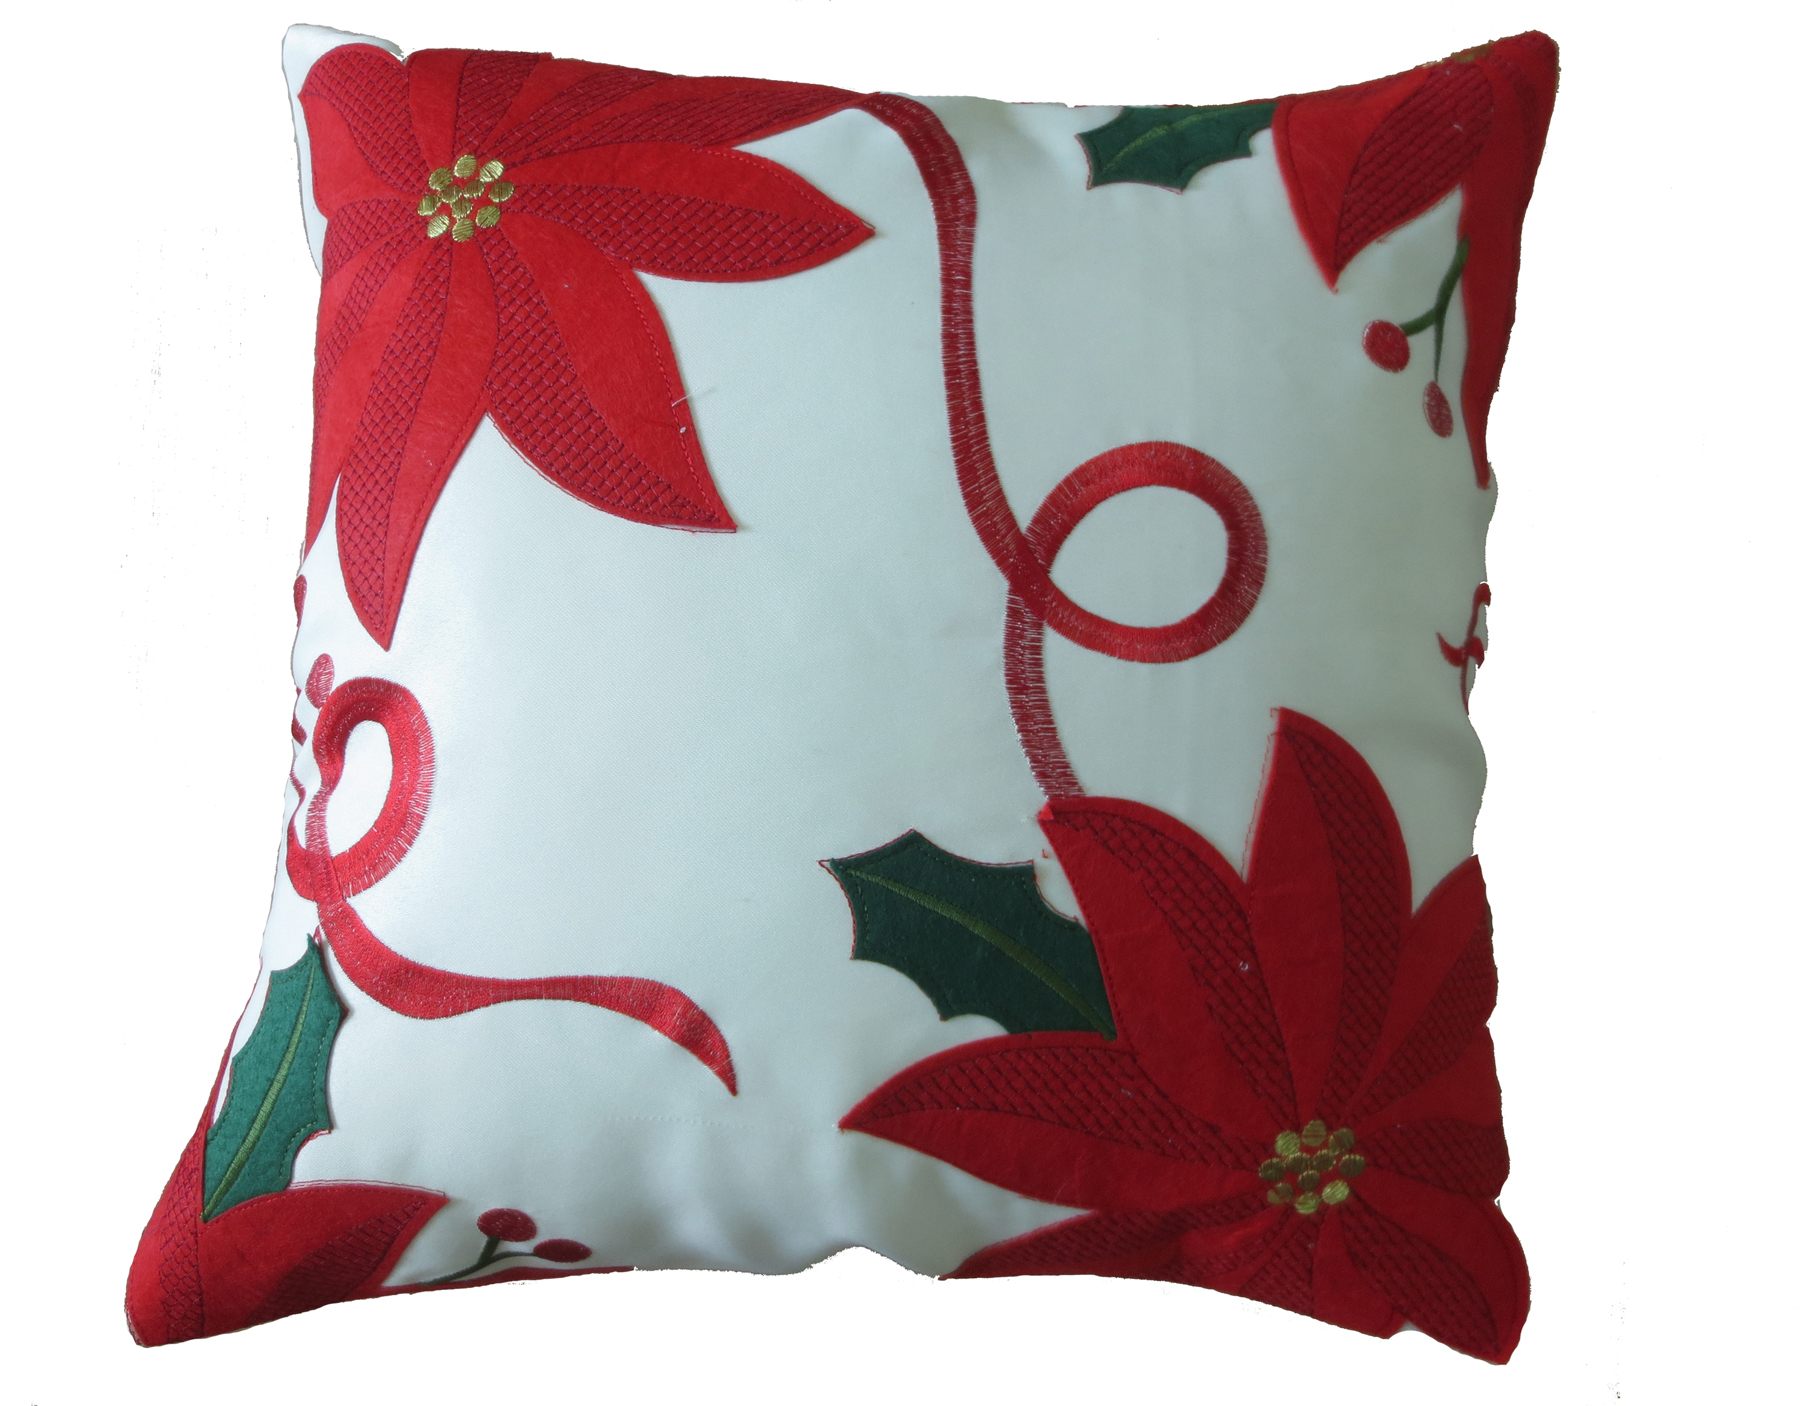 Decorative Christmas Pillows Throws : Decorative Christmas Embroidered Poinsettias Design Throw Pillow